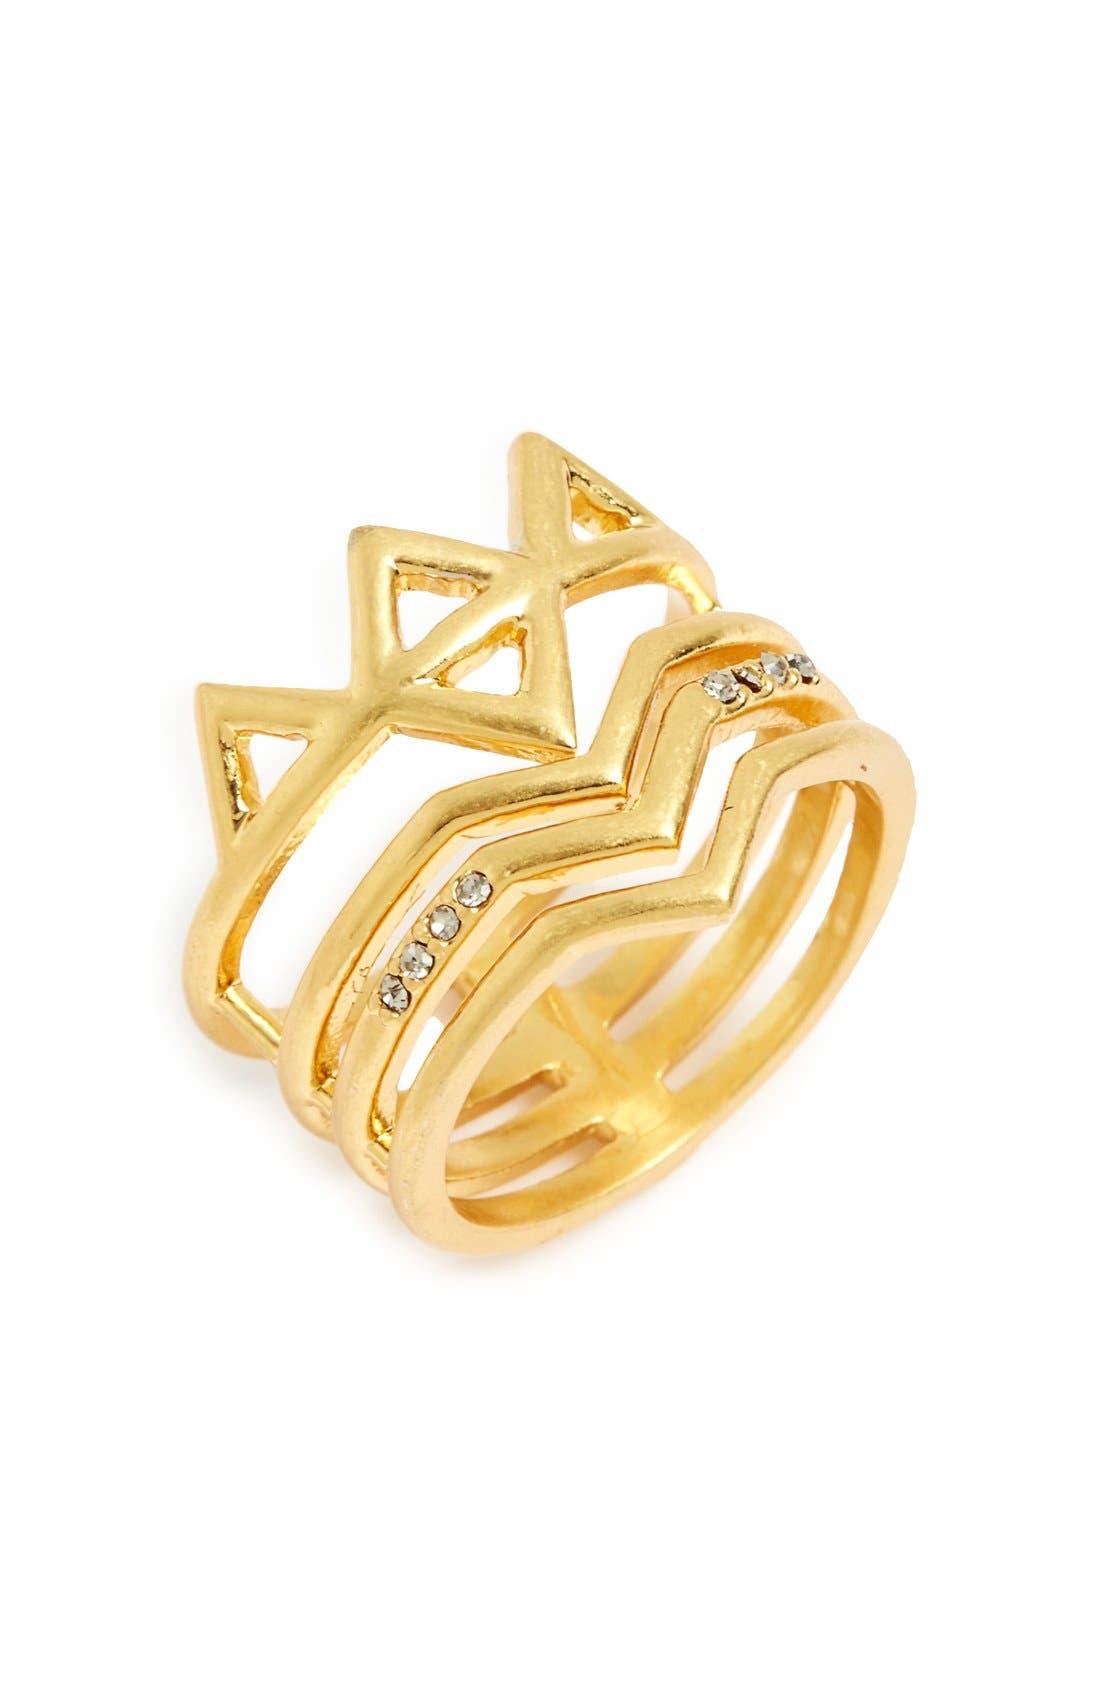 Main Image - Madewell 'Crownstack' Ring